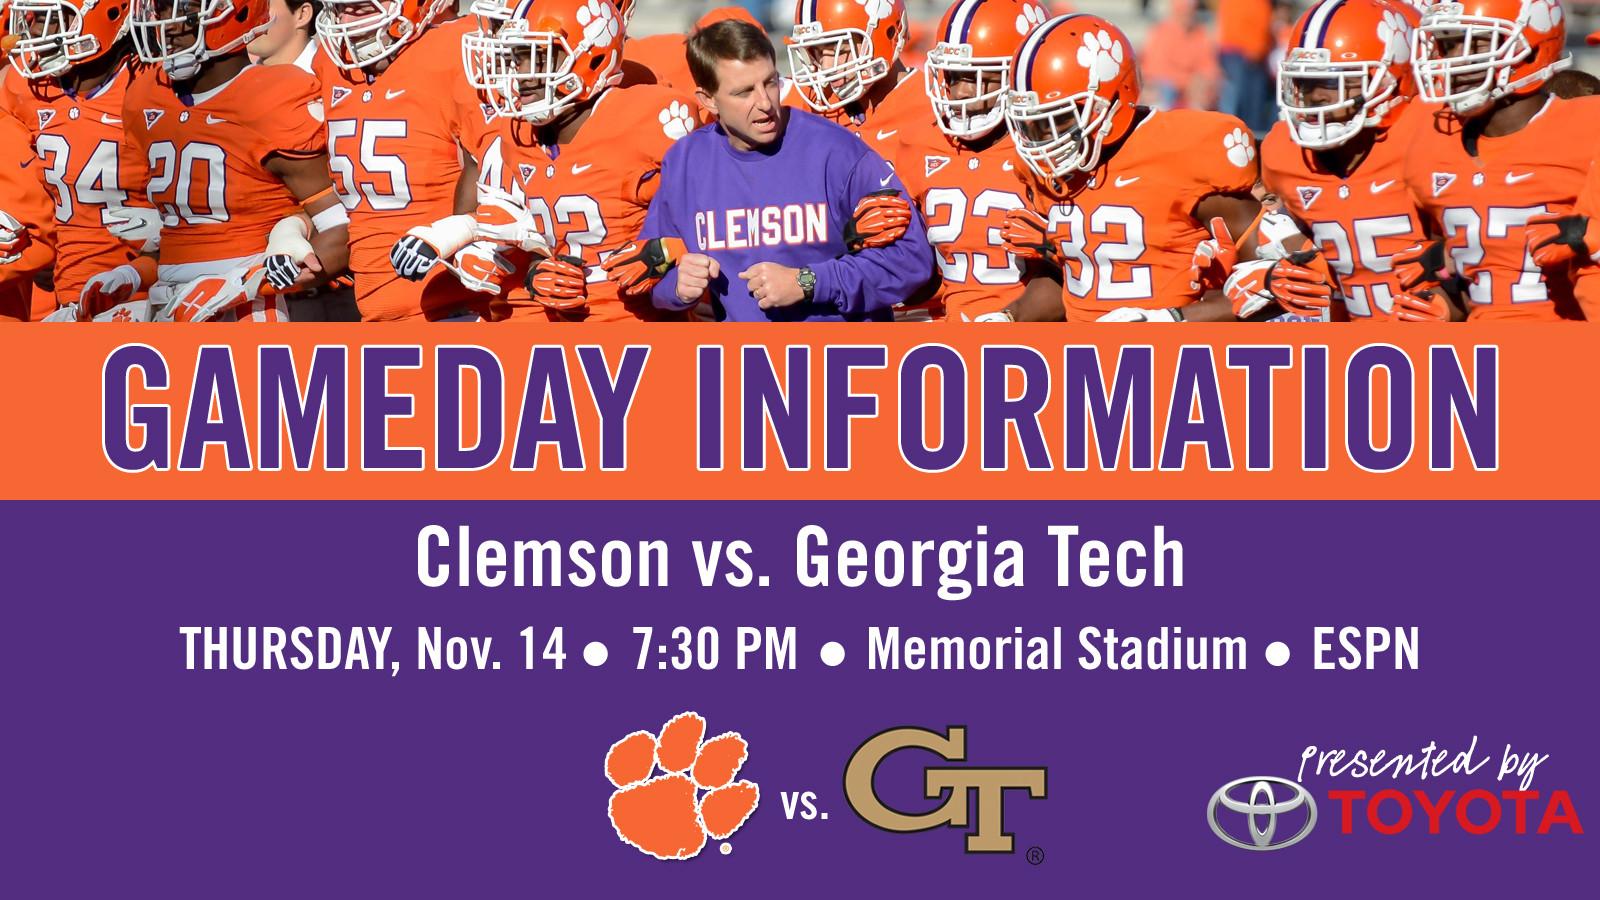 Clemson vs. Georgia Tech Football Gameday Information Guide